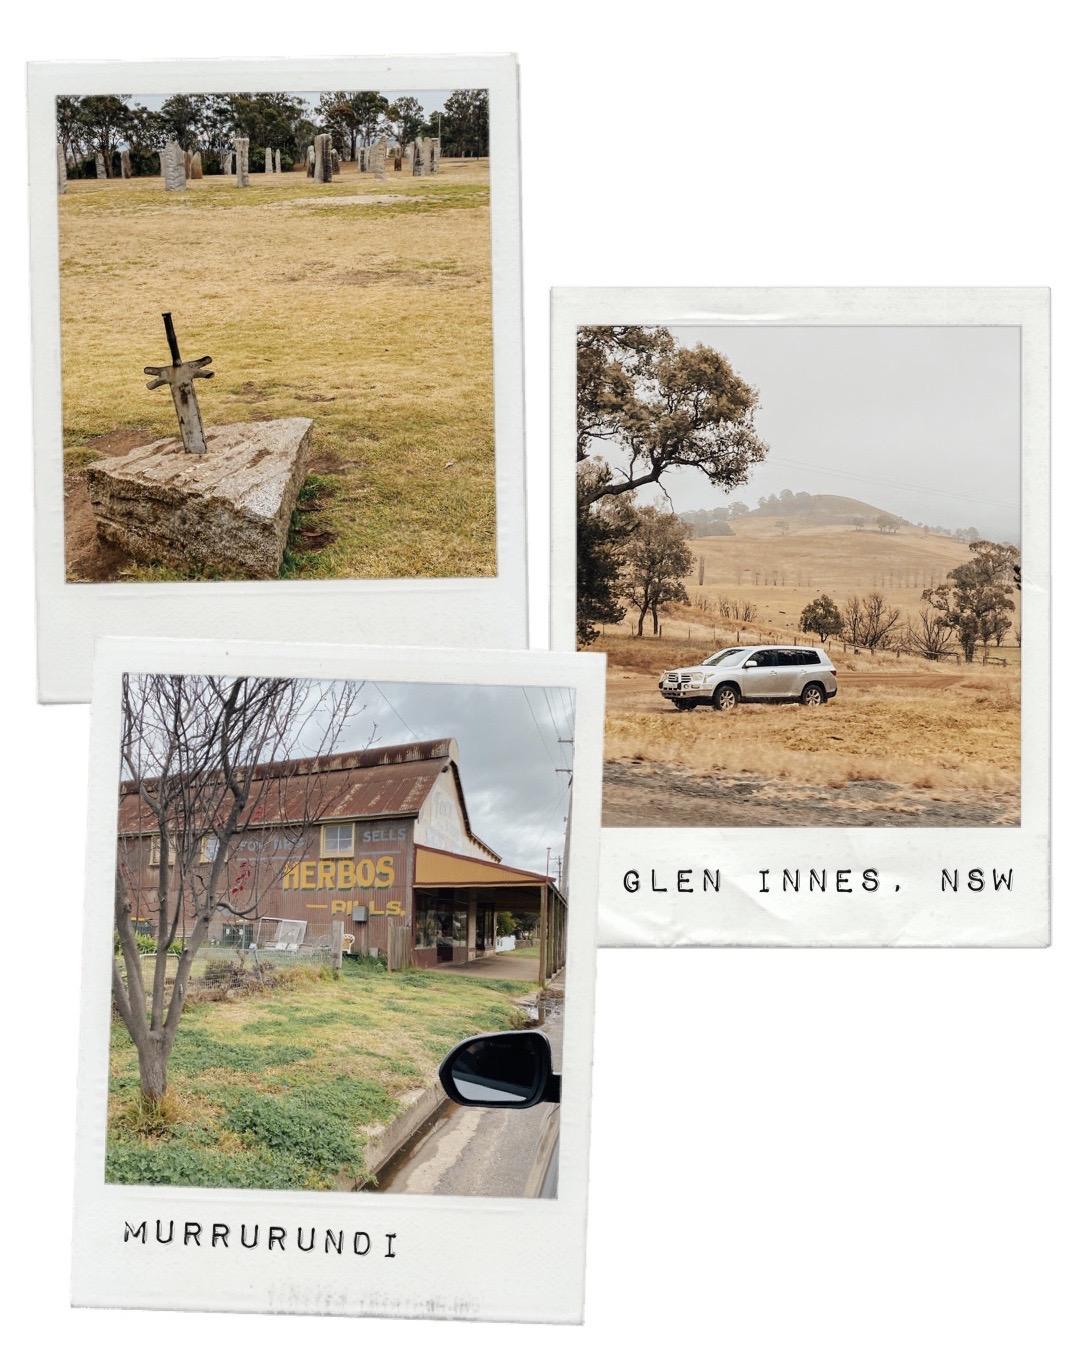 Australian Standing Stones, Glen Innes and Murrurundi